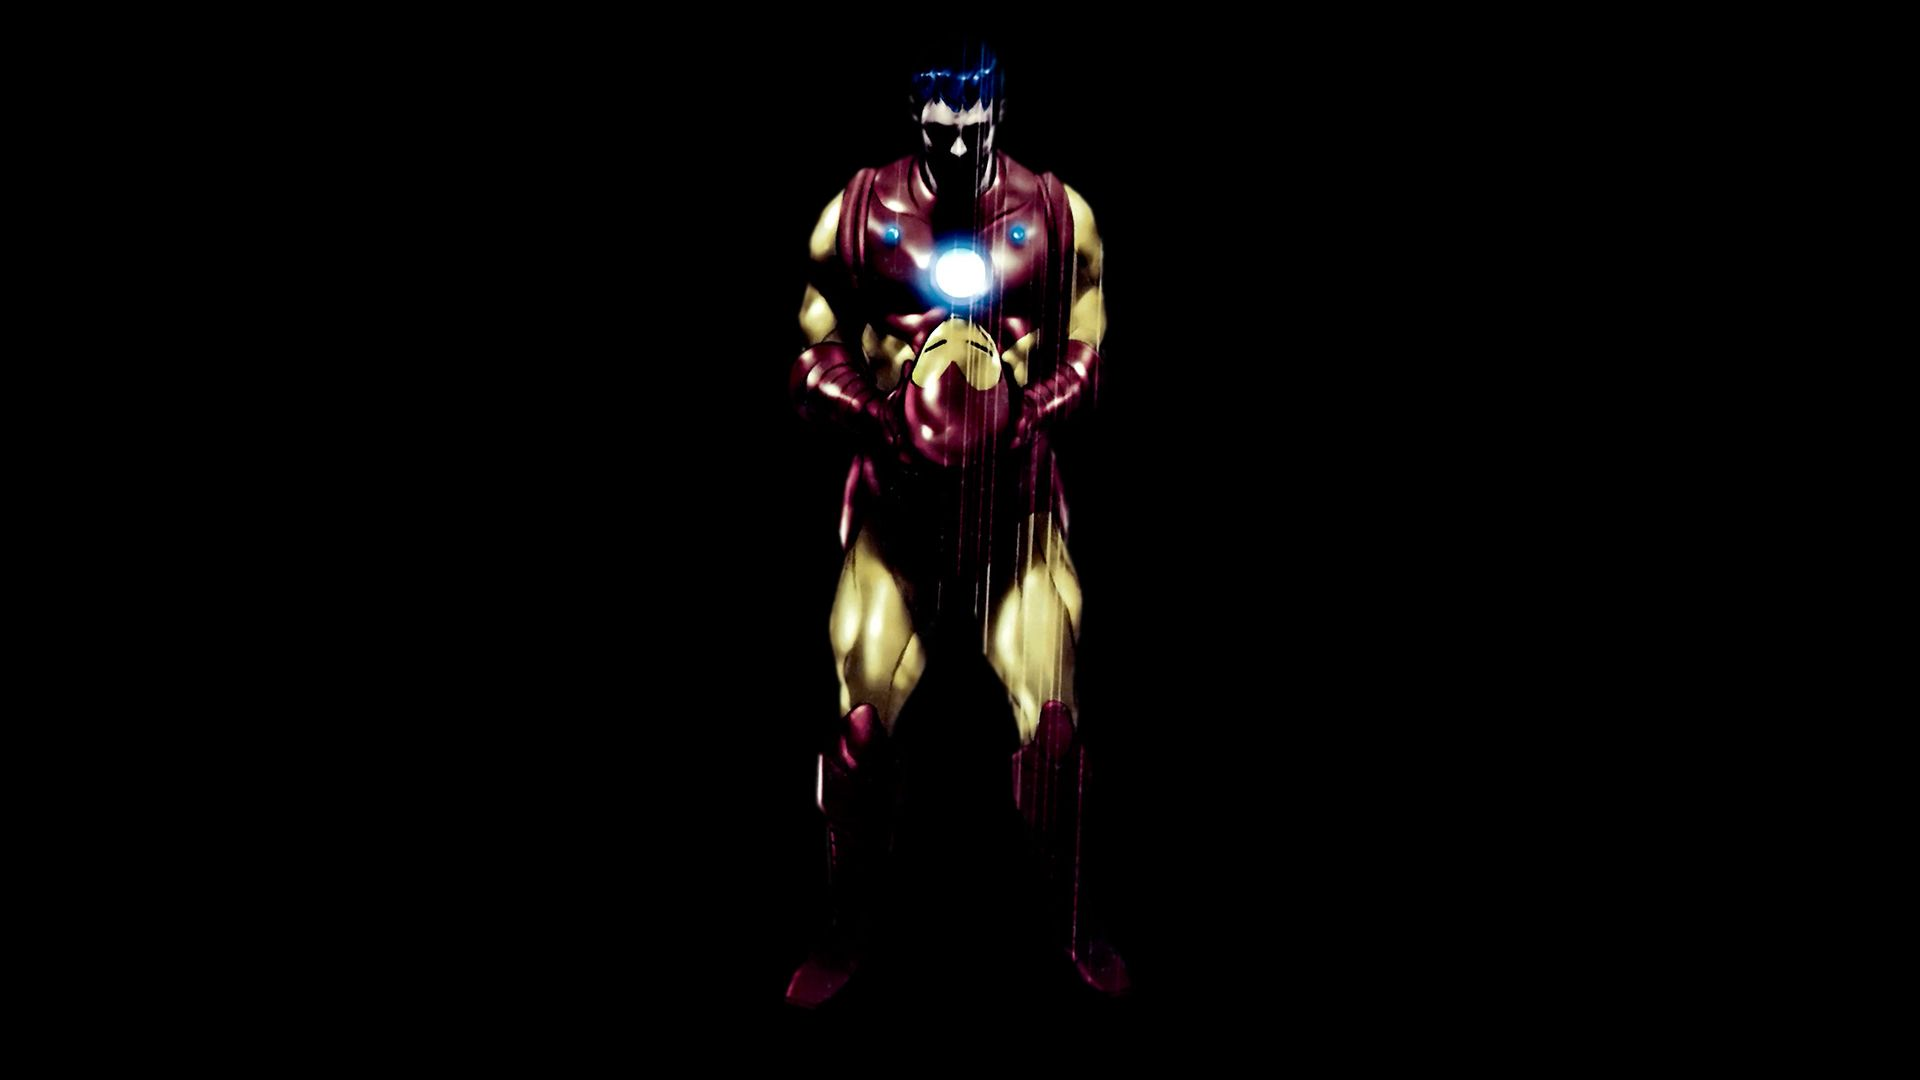 30 Iron Man Pic Iron Man Wallpapers Ludger Handforth